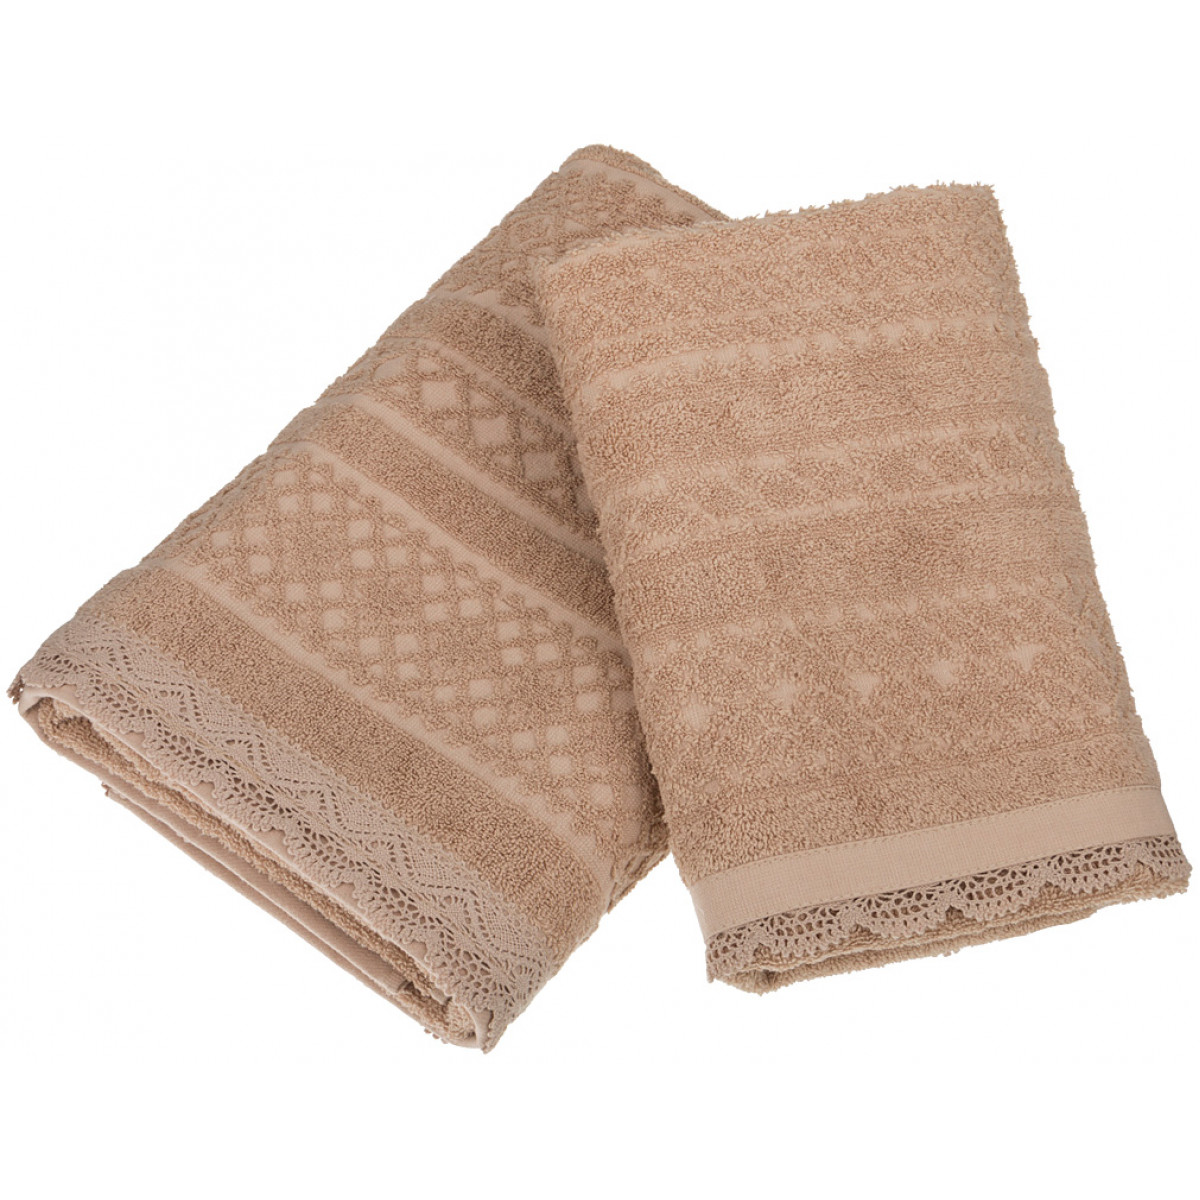 Полотенца Santalino Полотенце Nadine  (50х90 см,70х140 см) полотенца santalino полотенце shulamite 40х70 см